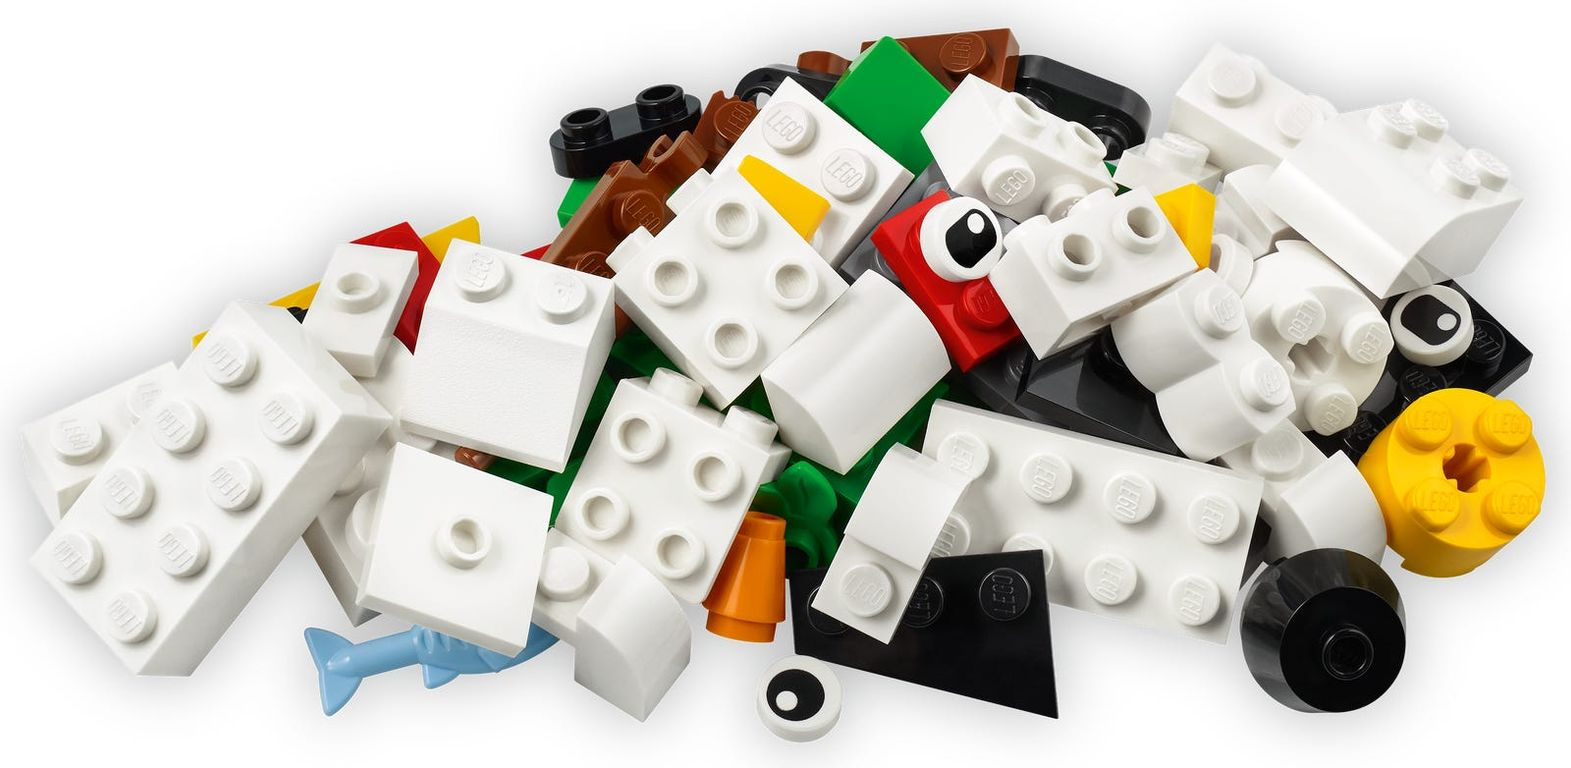 LEGO® Classic Creative White Bricks components